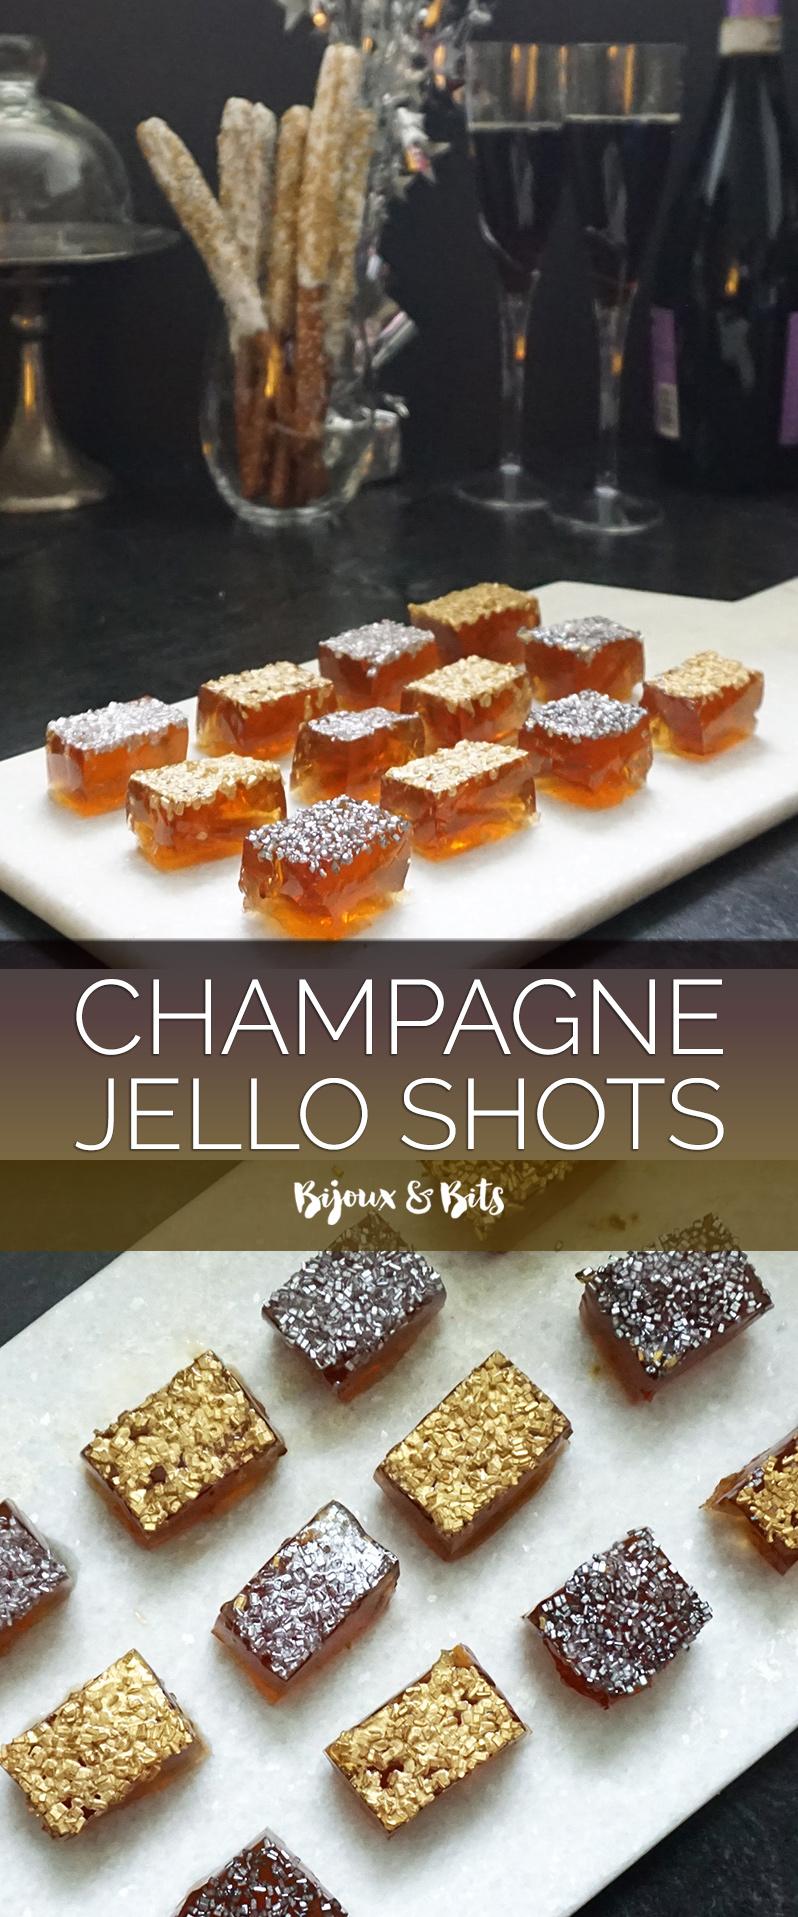 Champagne Jello shots from @bijouxandbits #jelloshots #oscars